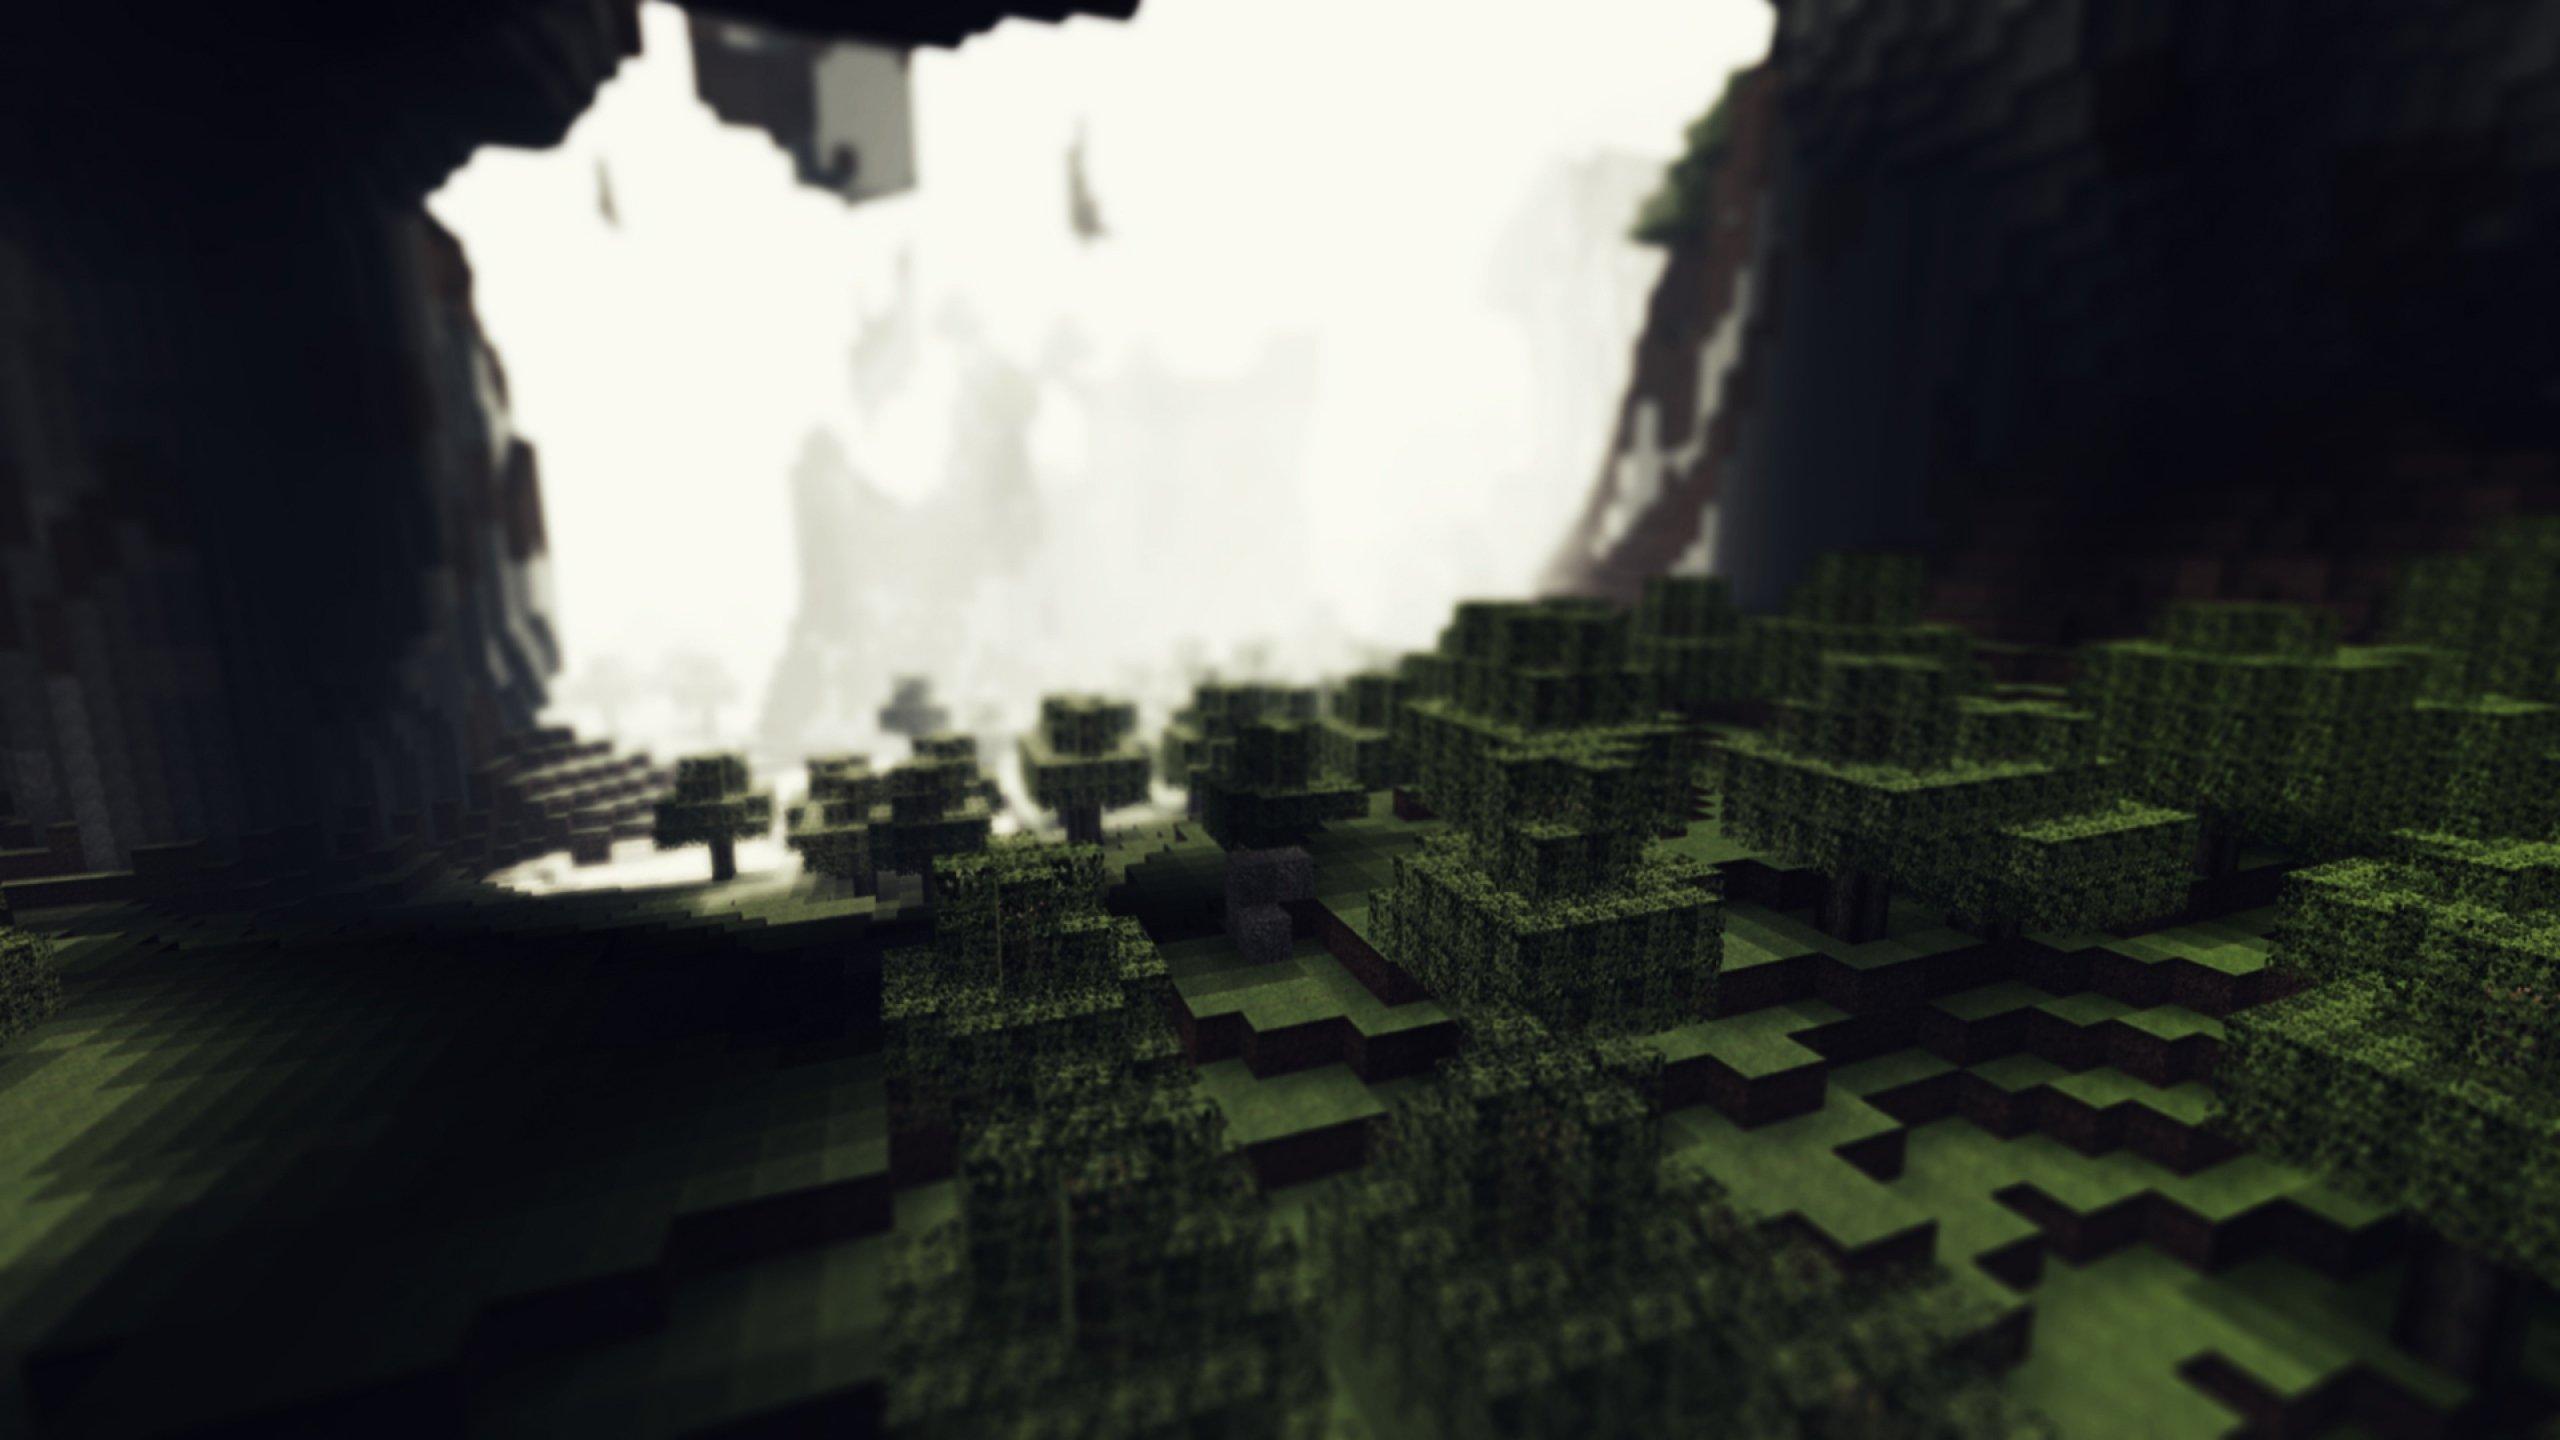 Download Wallpaper 2560x1440 Minecraft Cubes Ground Cave Mac iMac 2560x1440